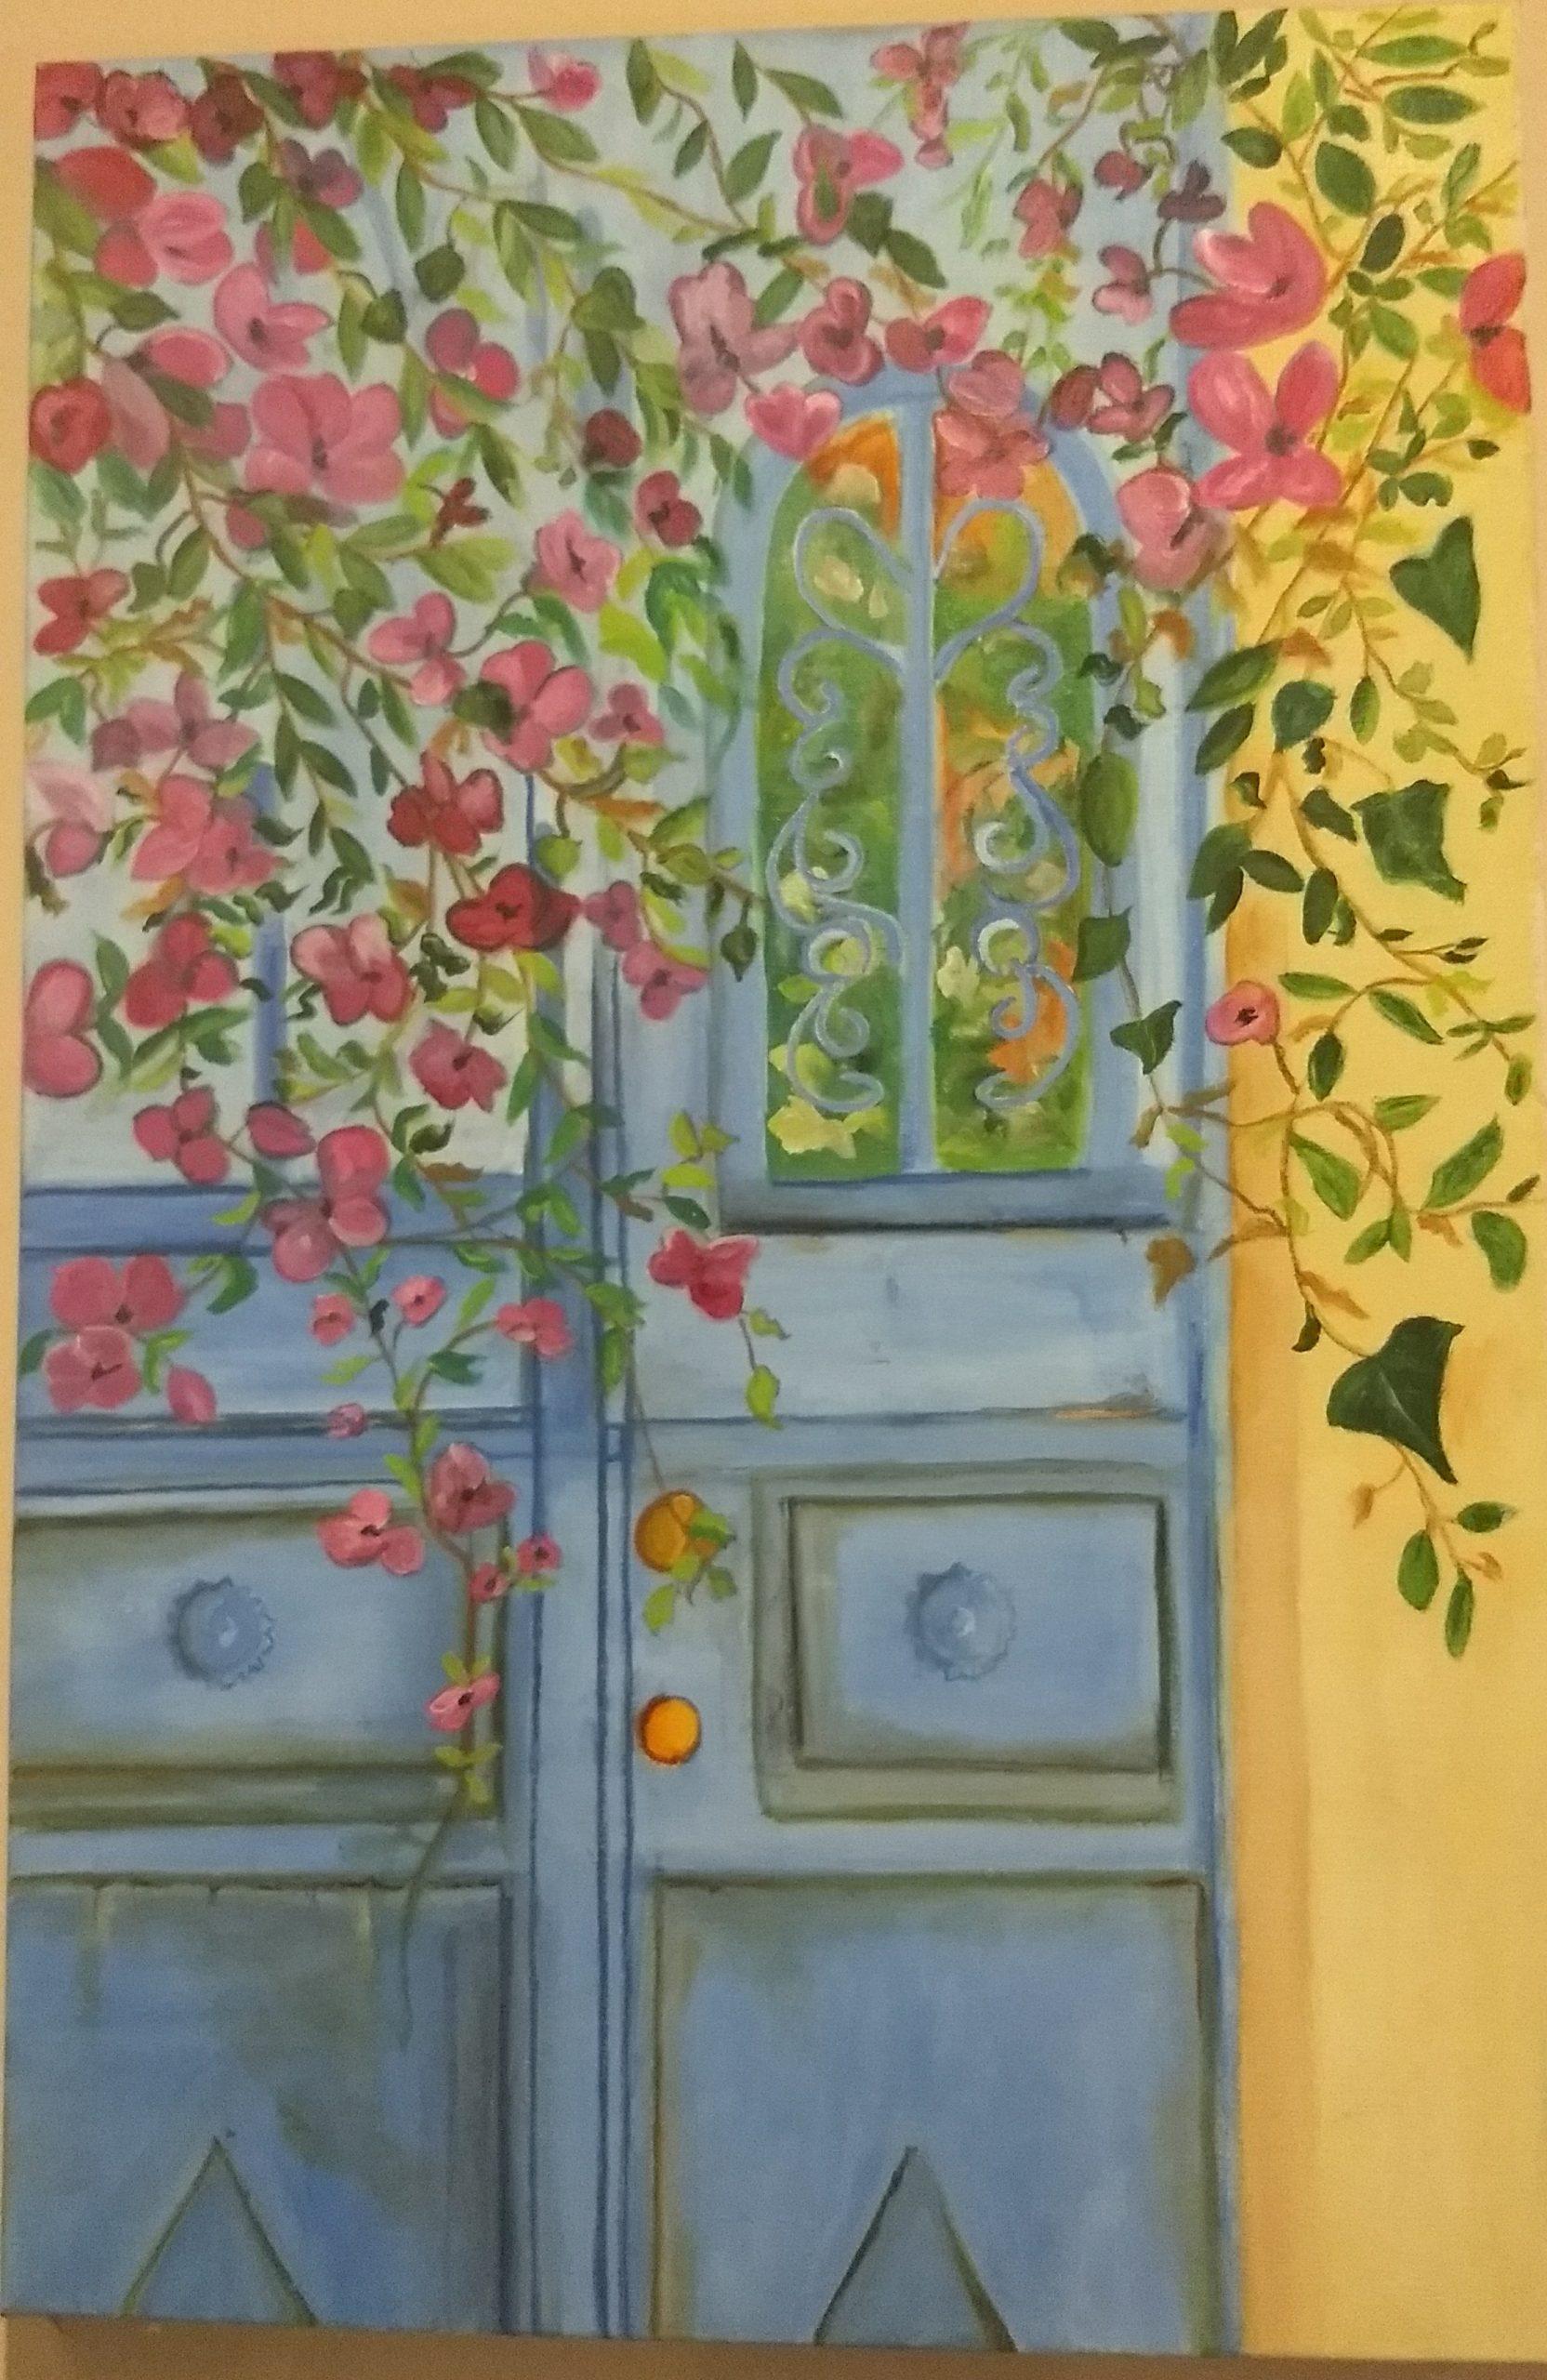 Silvia Portaluppi | Serie Natural. La calle de los suspiros. Oleo 60 x 40 cm.